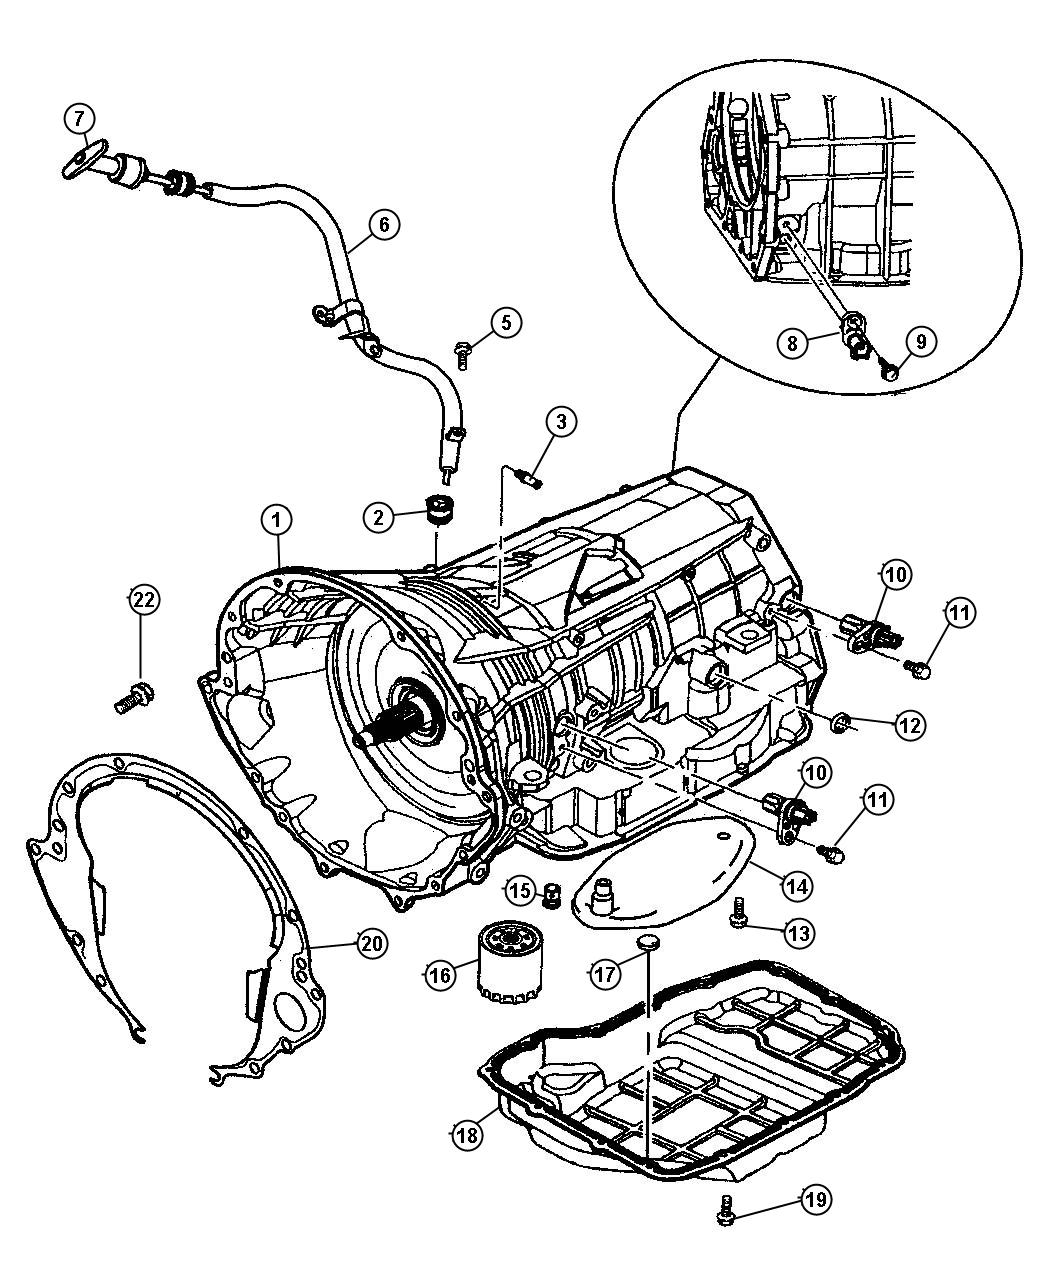 Dodge Dakota Case Amp Related Parts 45rfe Dg4